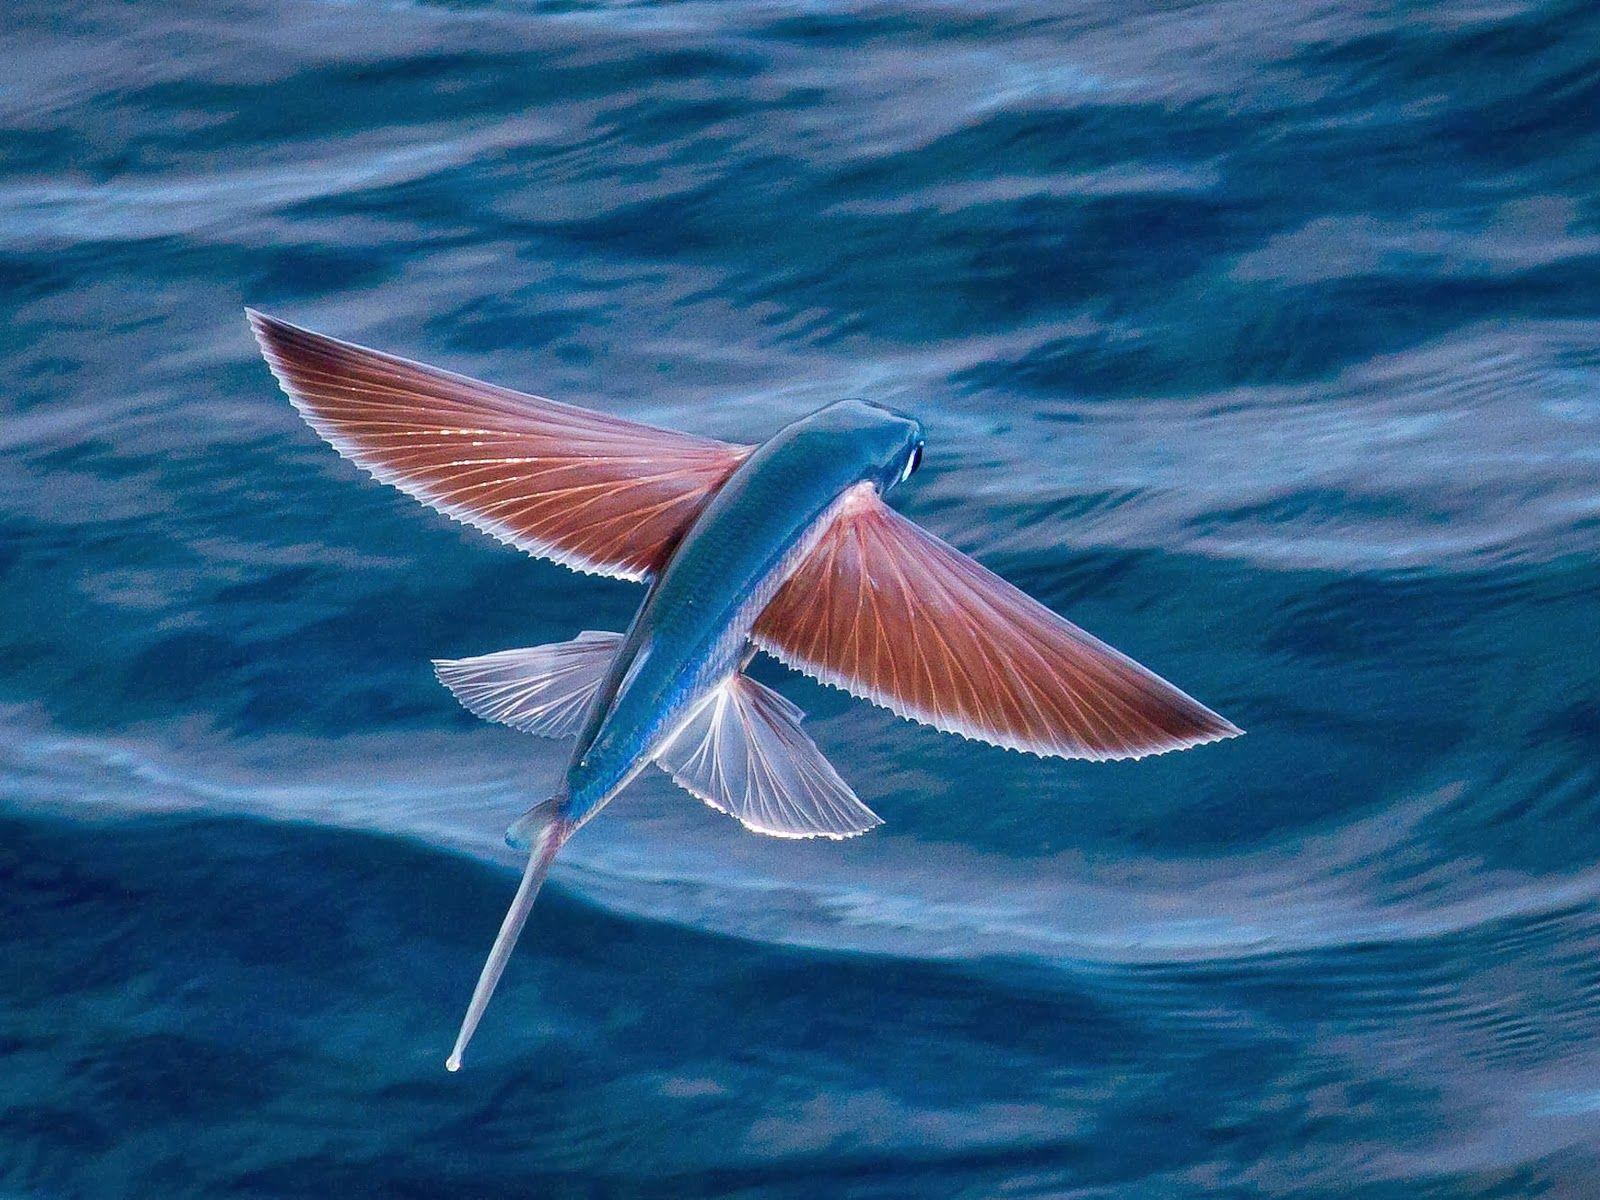 flying fish wals Water animals, Beautiful fish, Sea animals